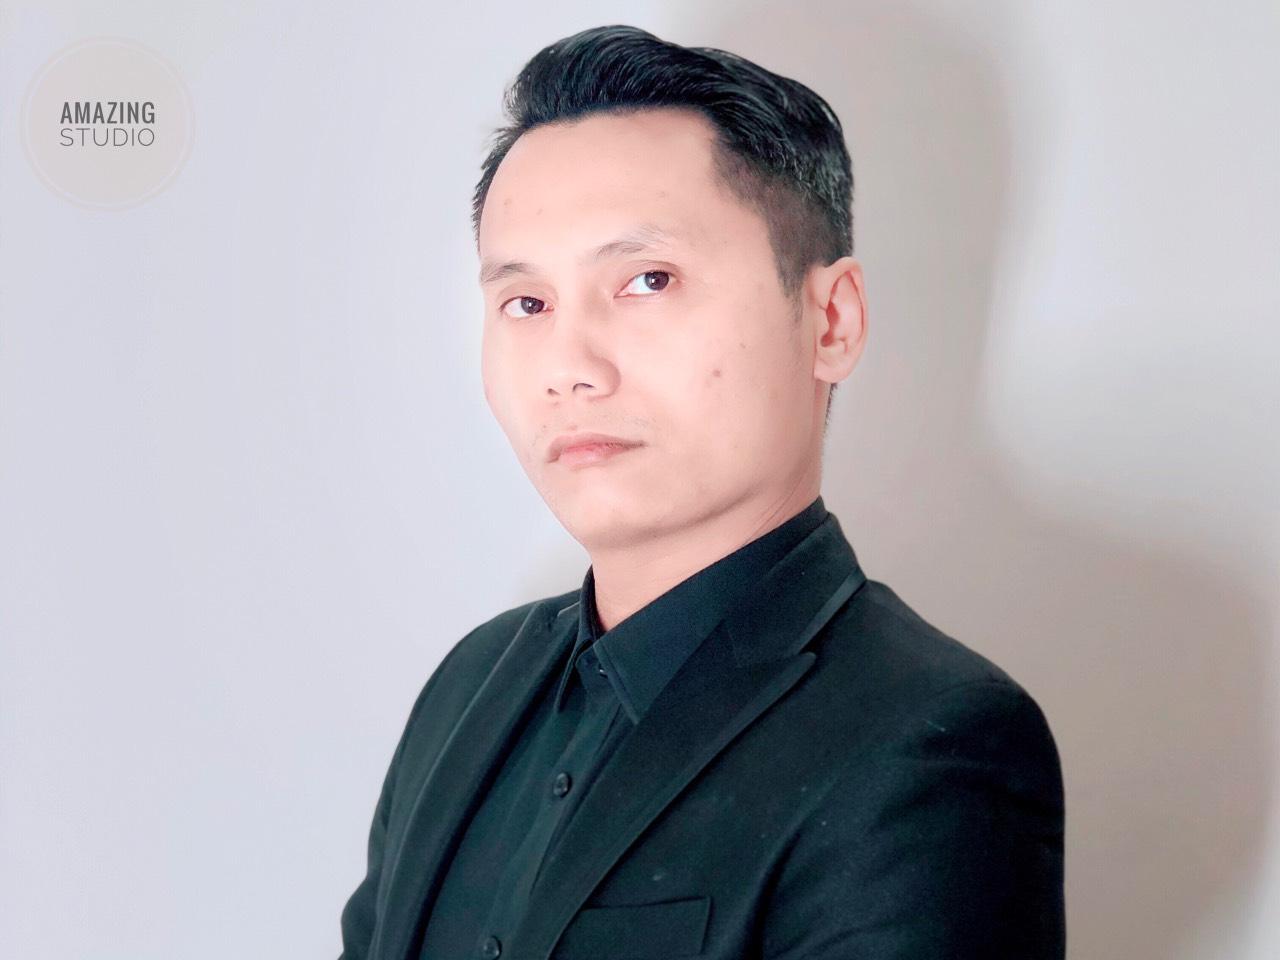 Trần Thái Hòa